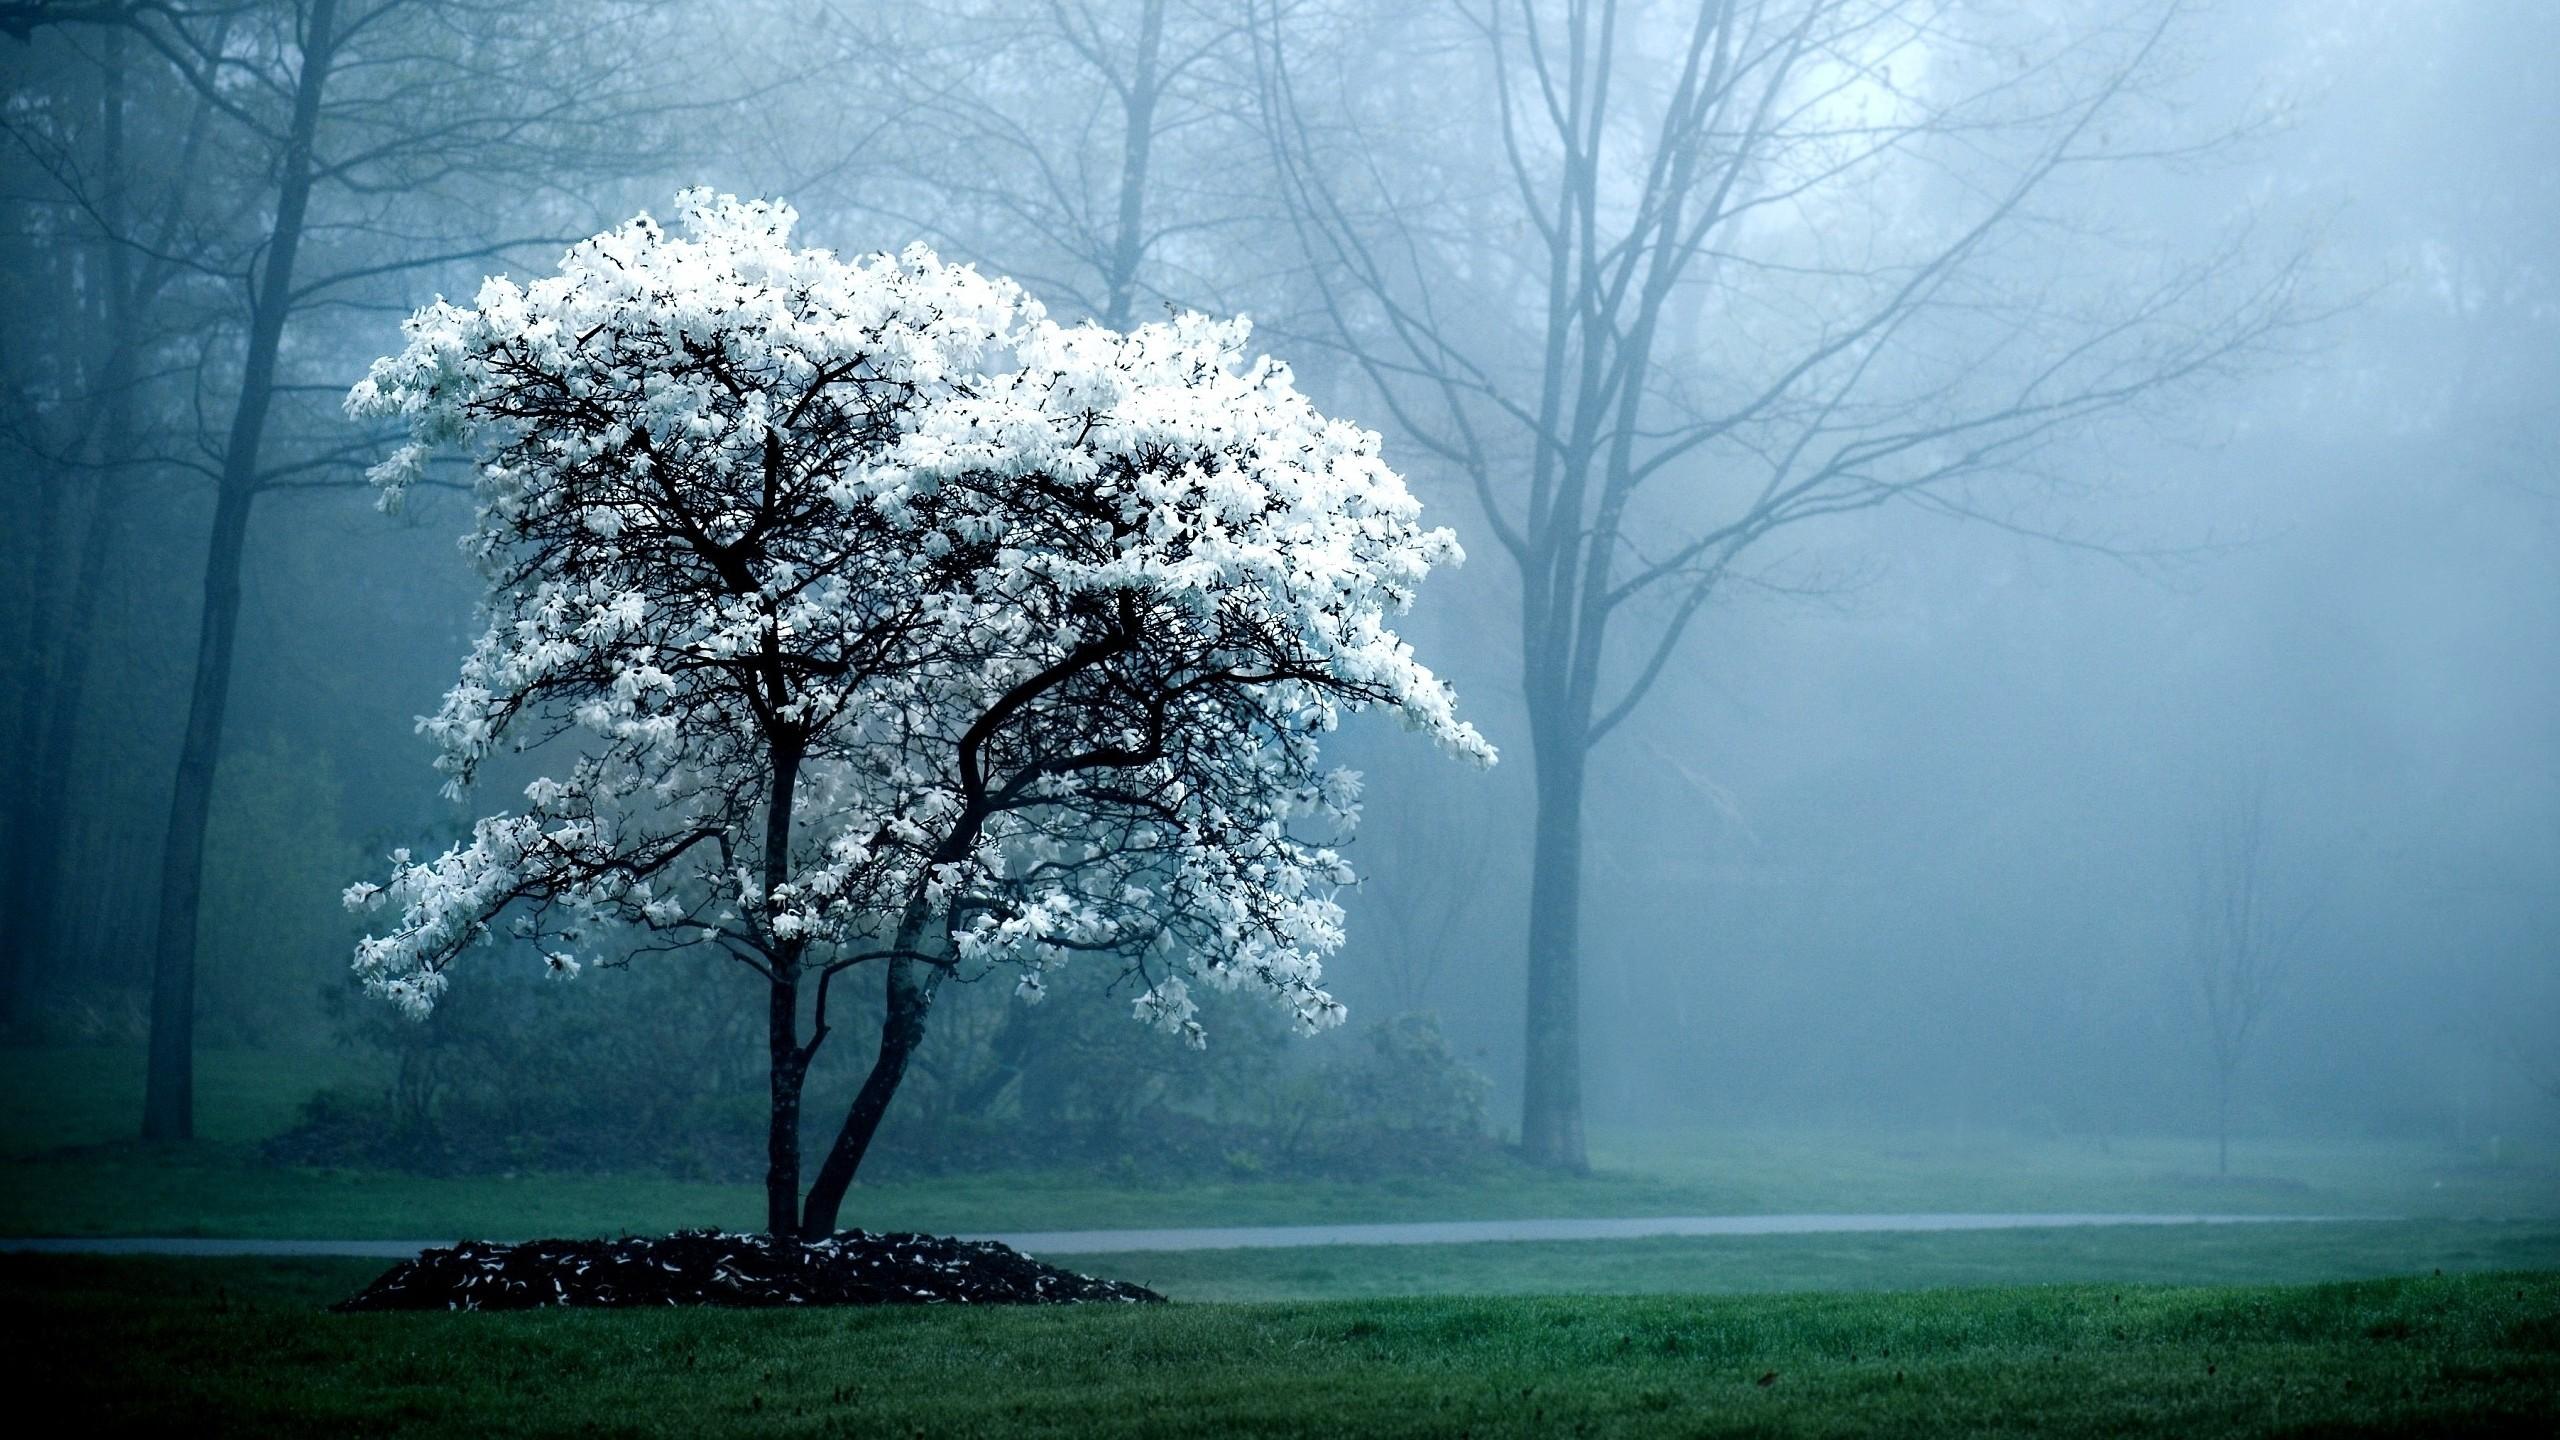 Деревья в тумане картинки